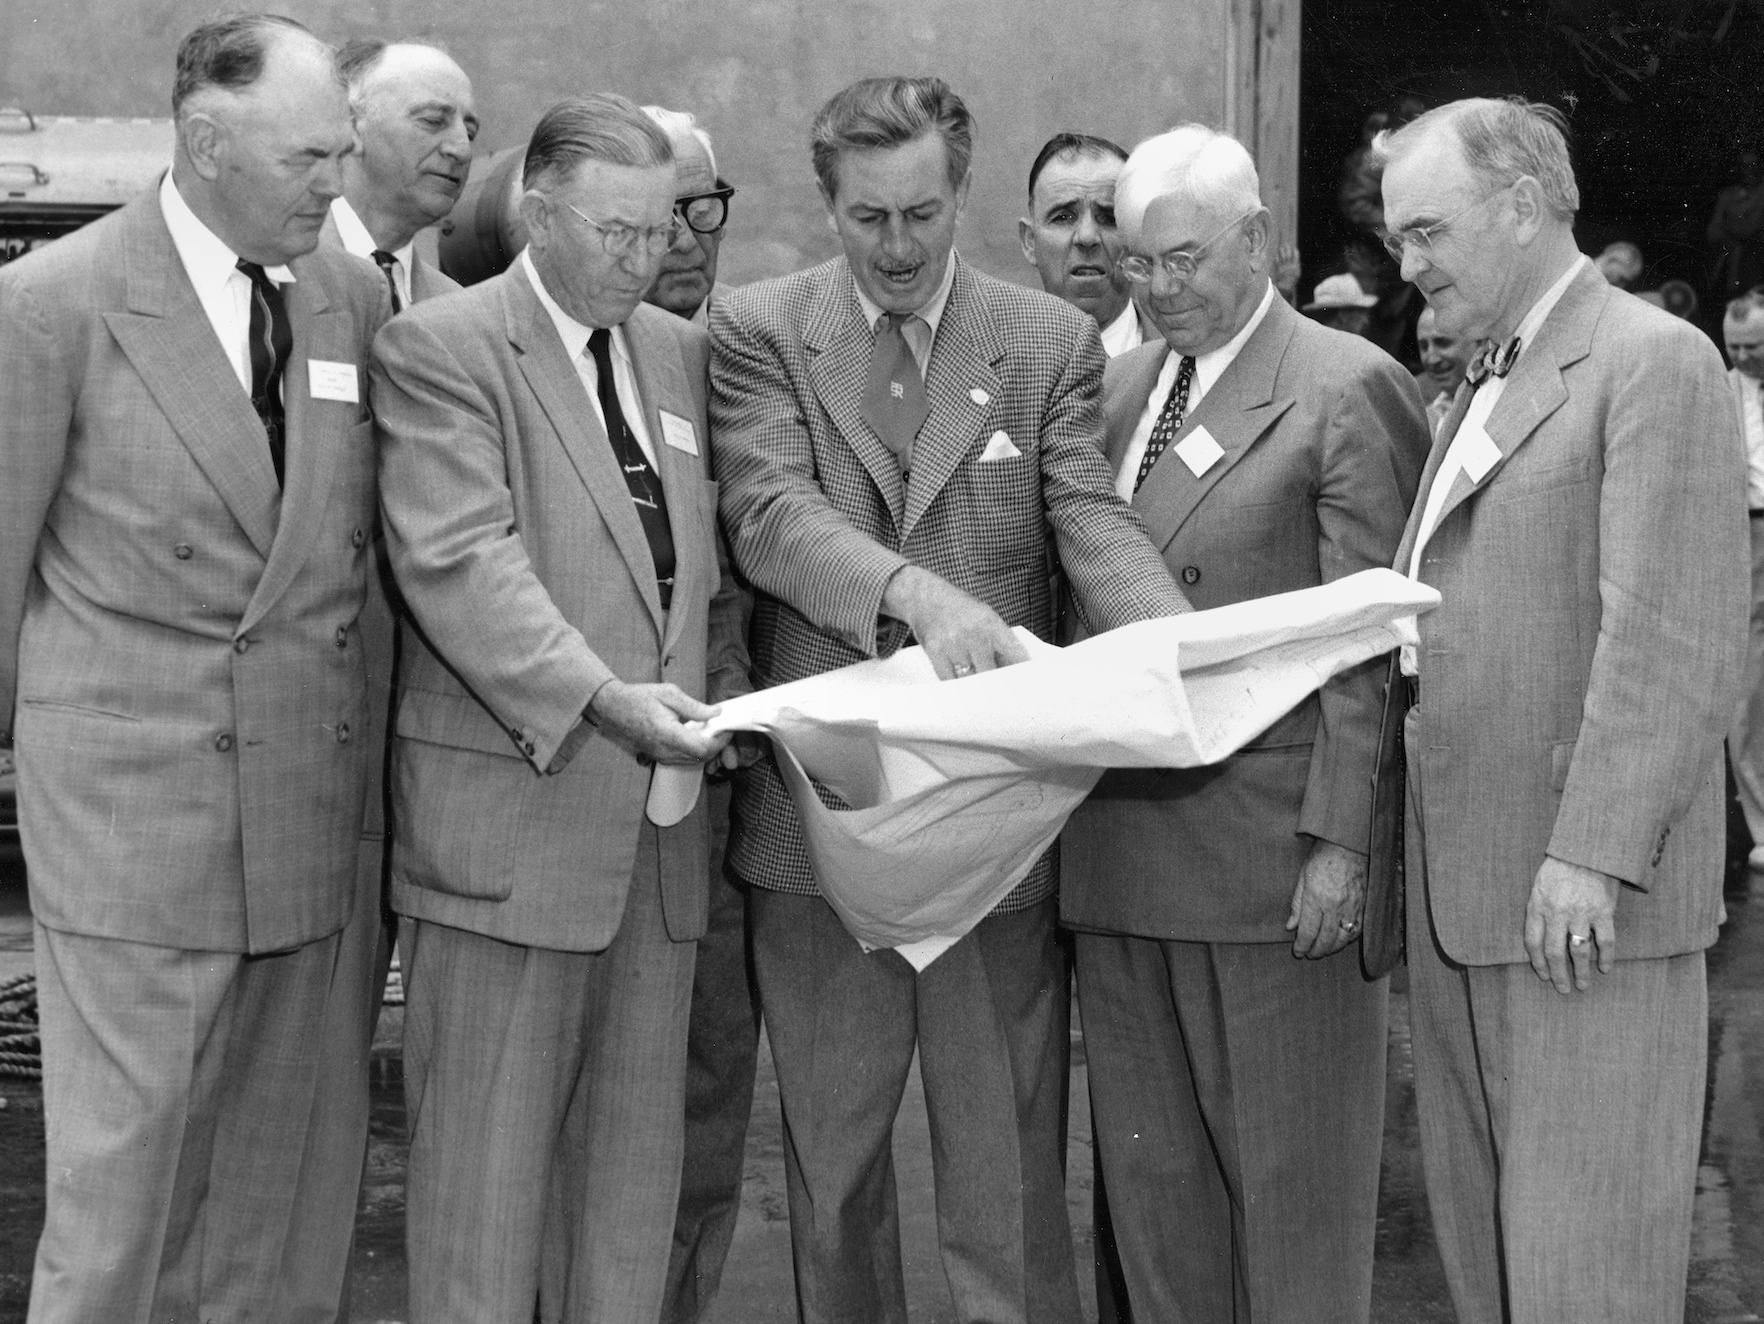 Walt Disney shows Disneyland plans to Orange County officials in December 1954.